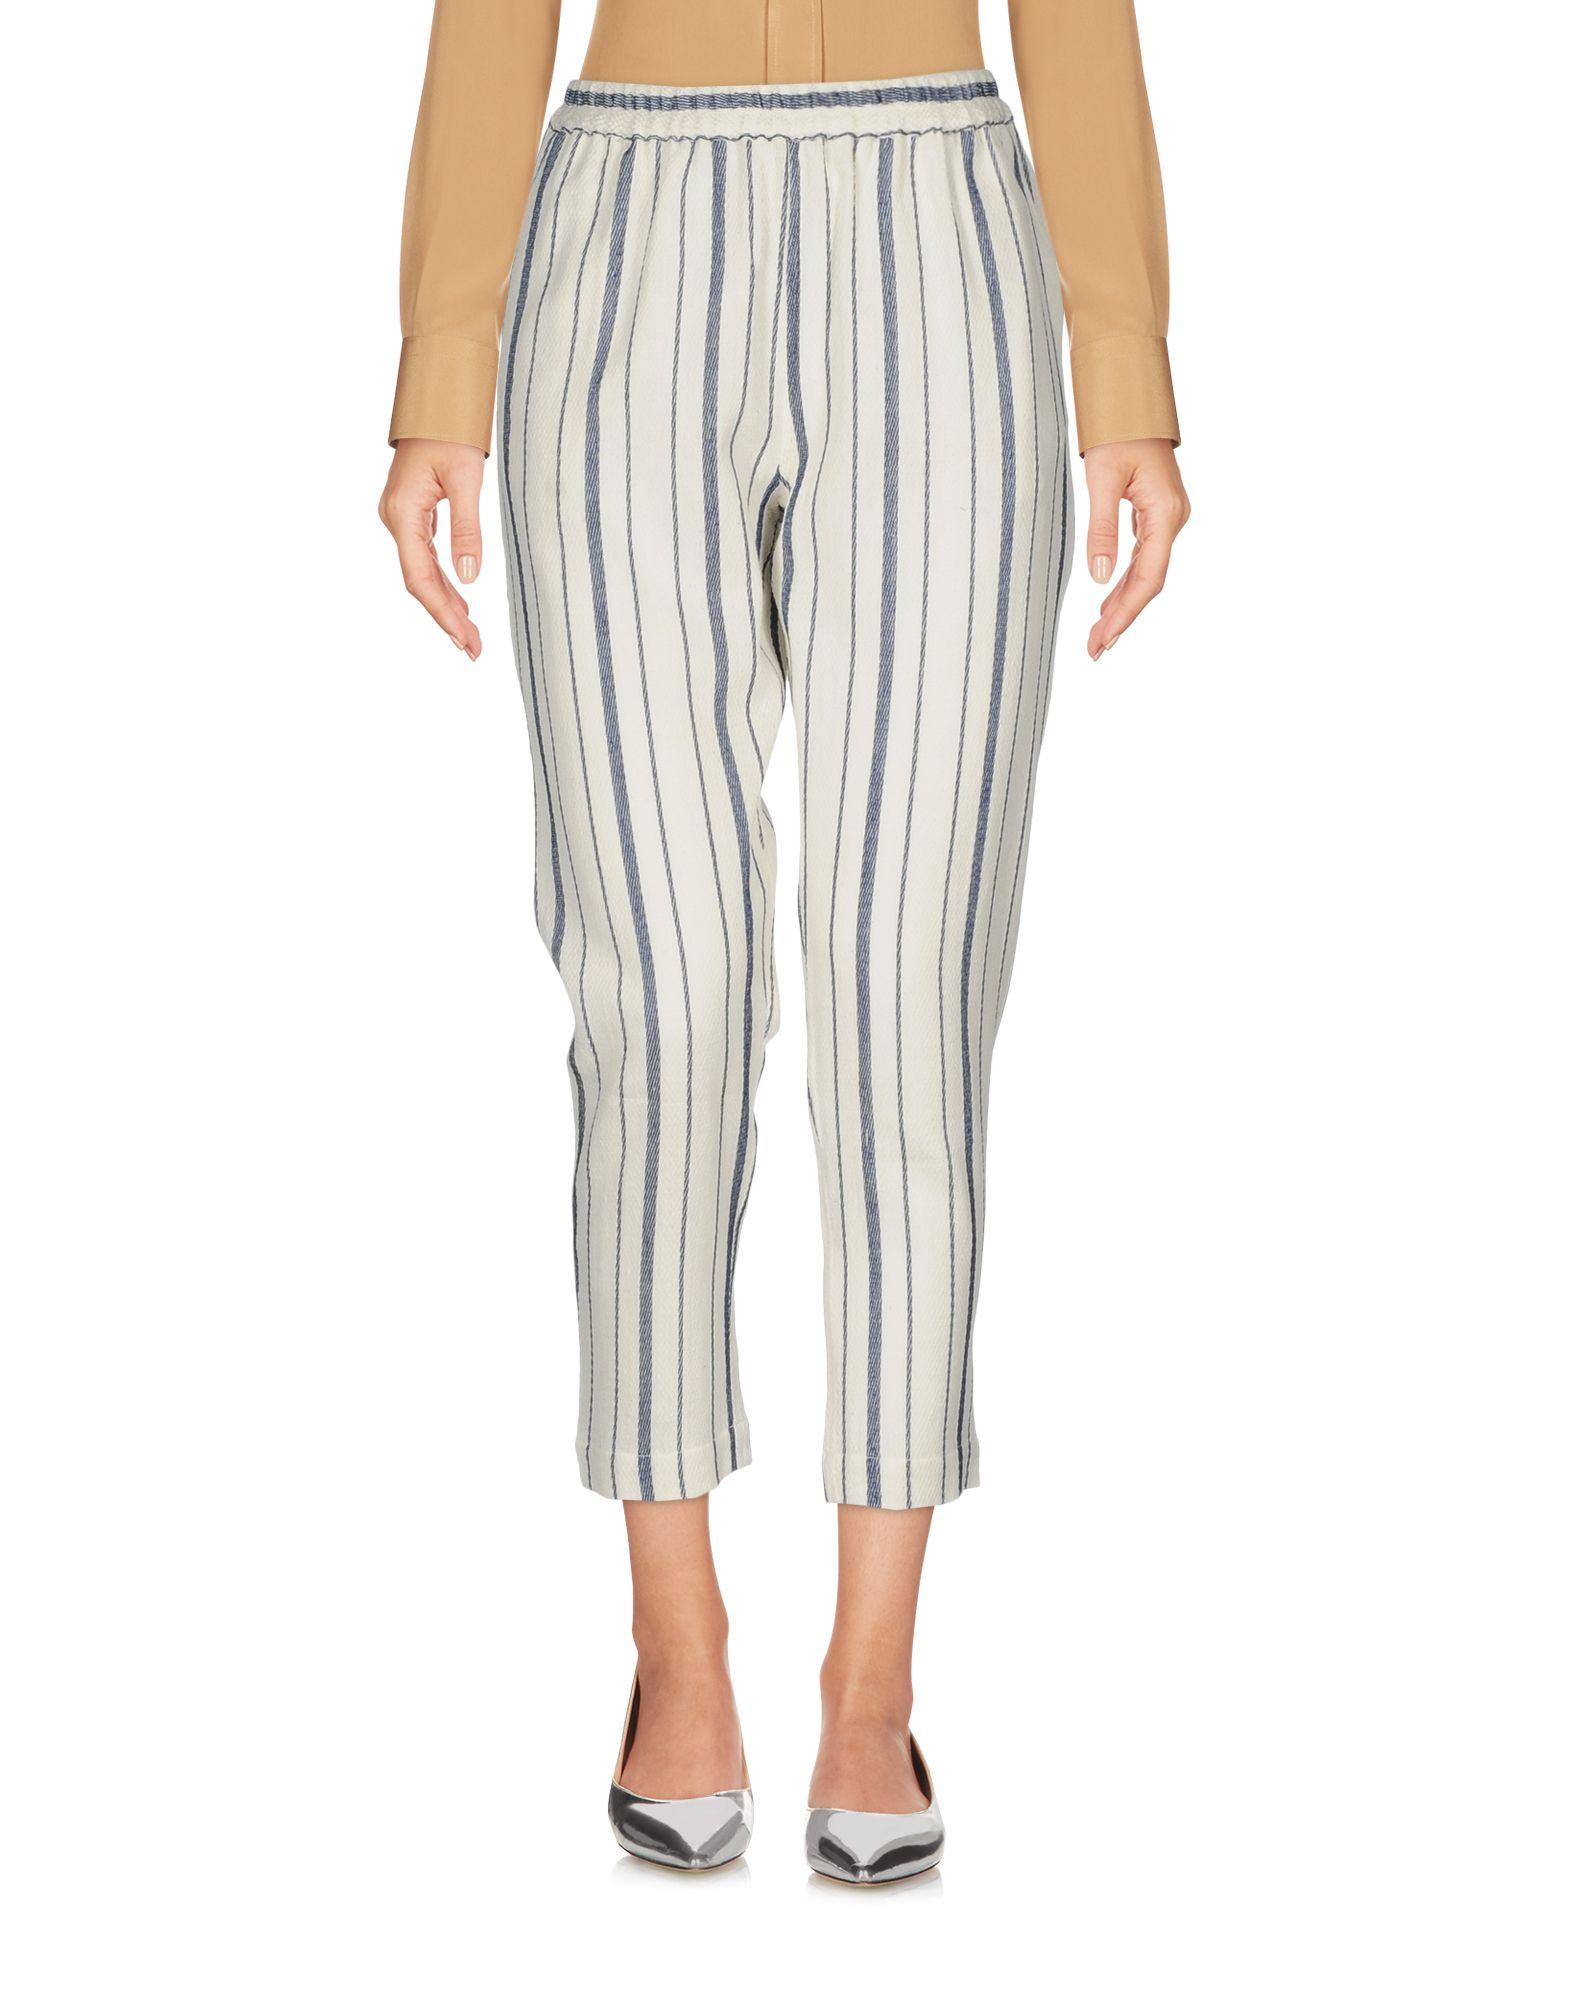 BELLA JONES Брюки-капри брюки bella kareema брюки базовые на резинке